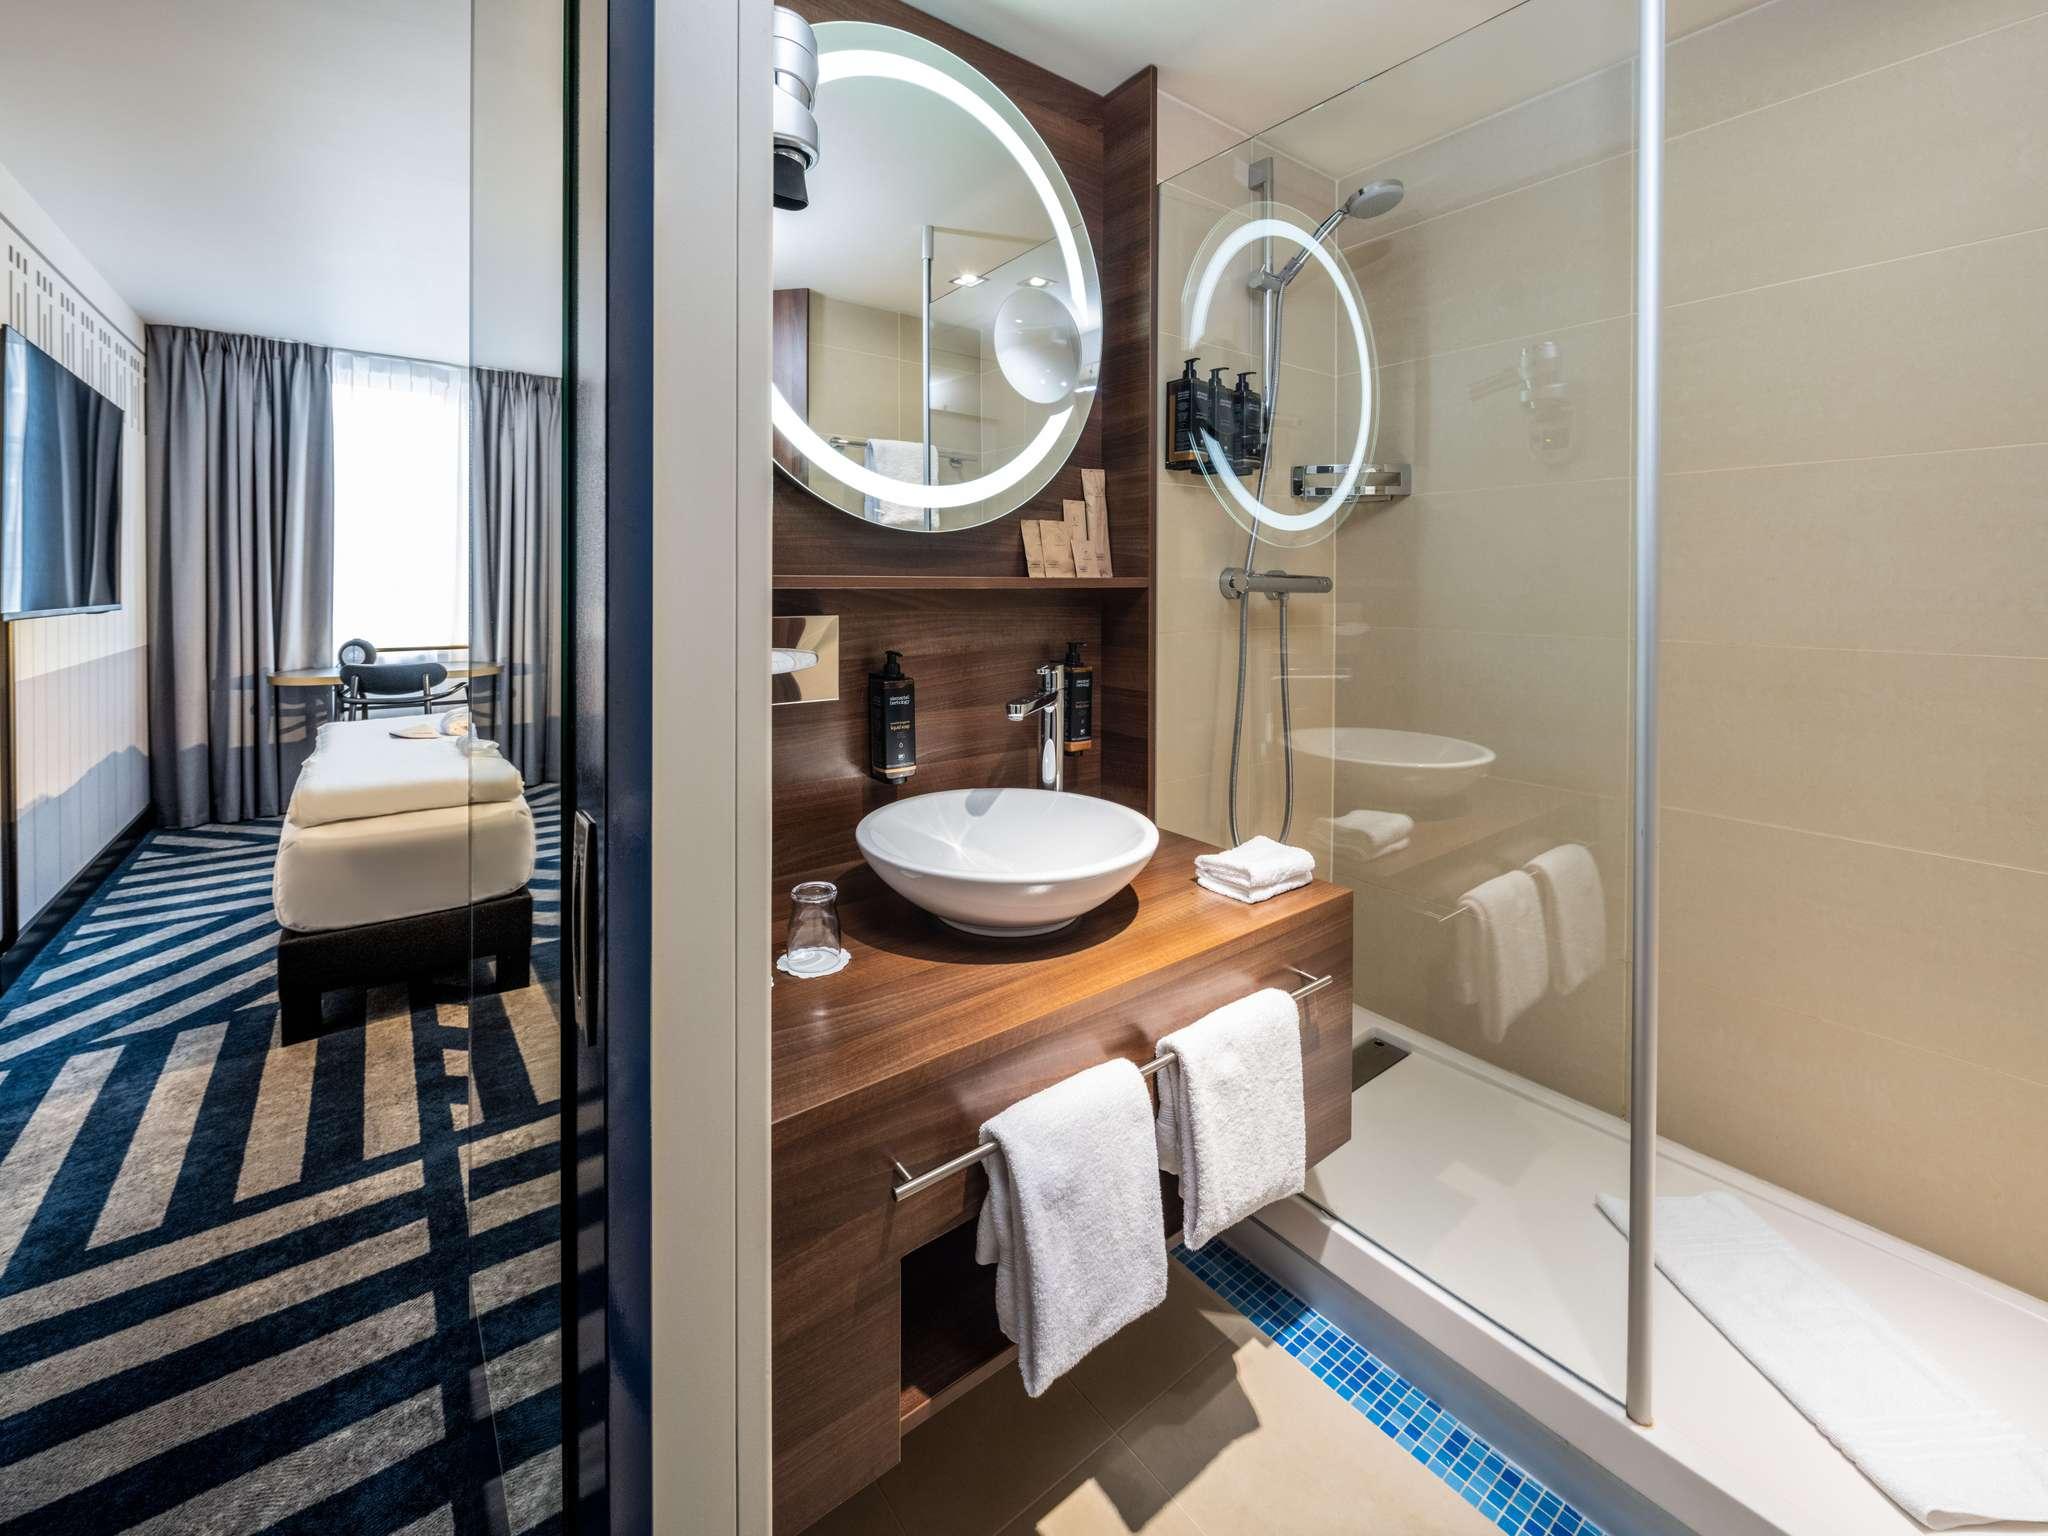 Hotel Mercure Wien City**** - Hotel 1020 Vienna | ACCOR